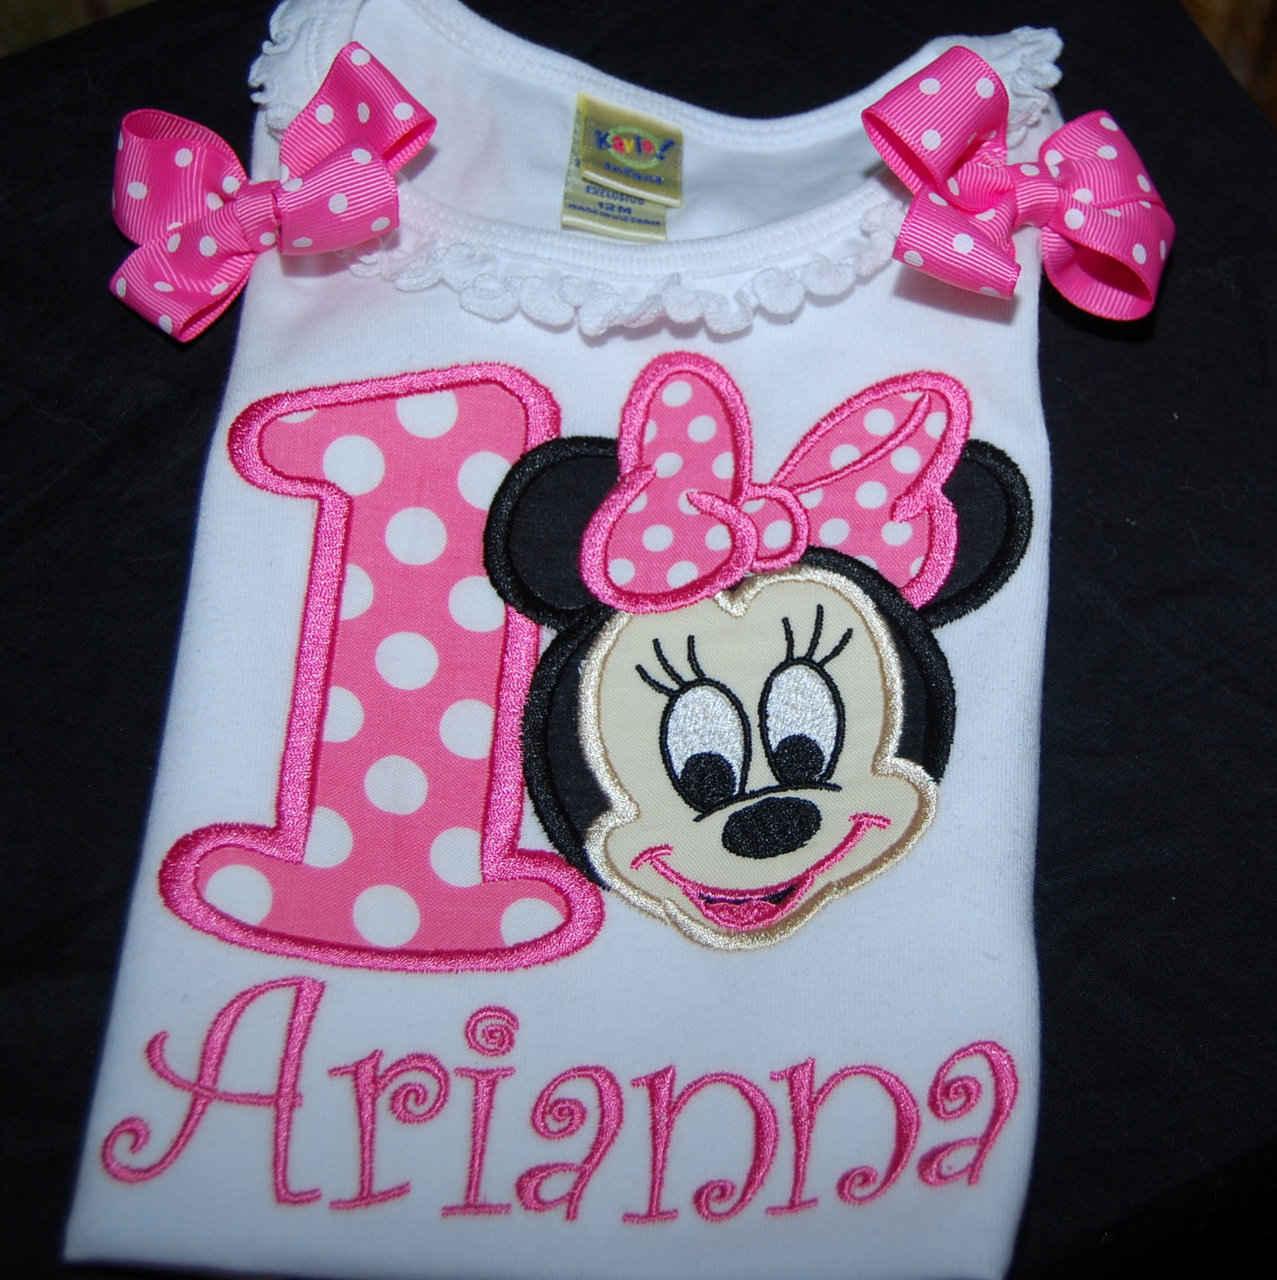 personalized birthday shirt, 1st birthday shirt, Minnie Mouse birthday party, pink birthday shirt baby Minnie Mouse personalized shirt